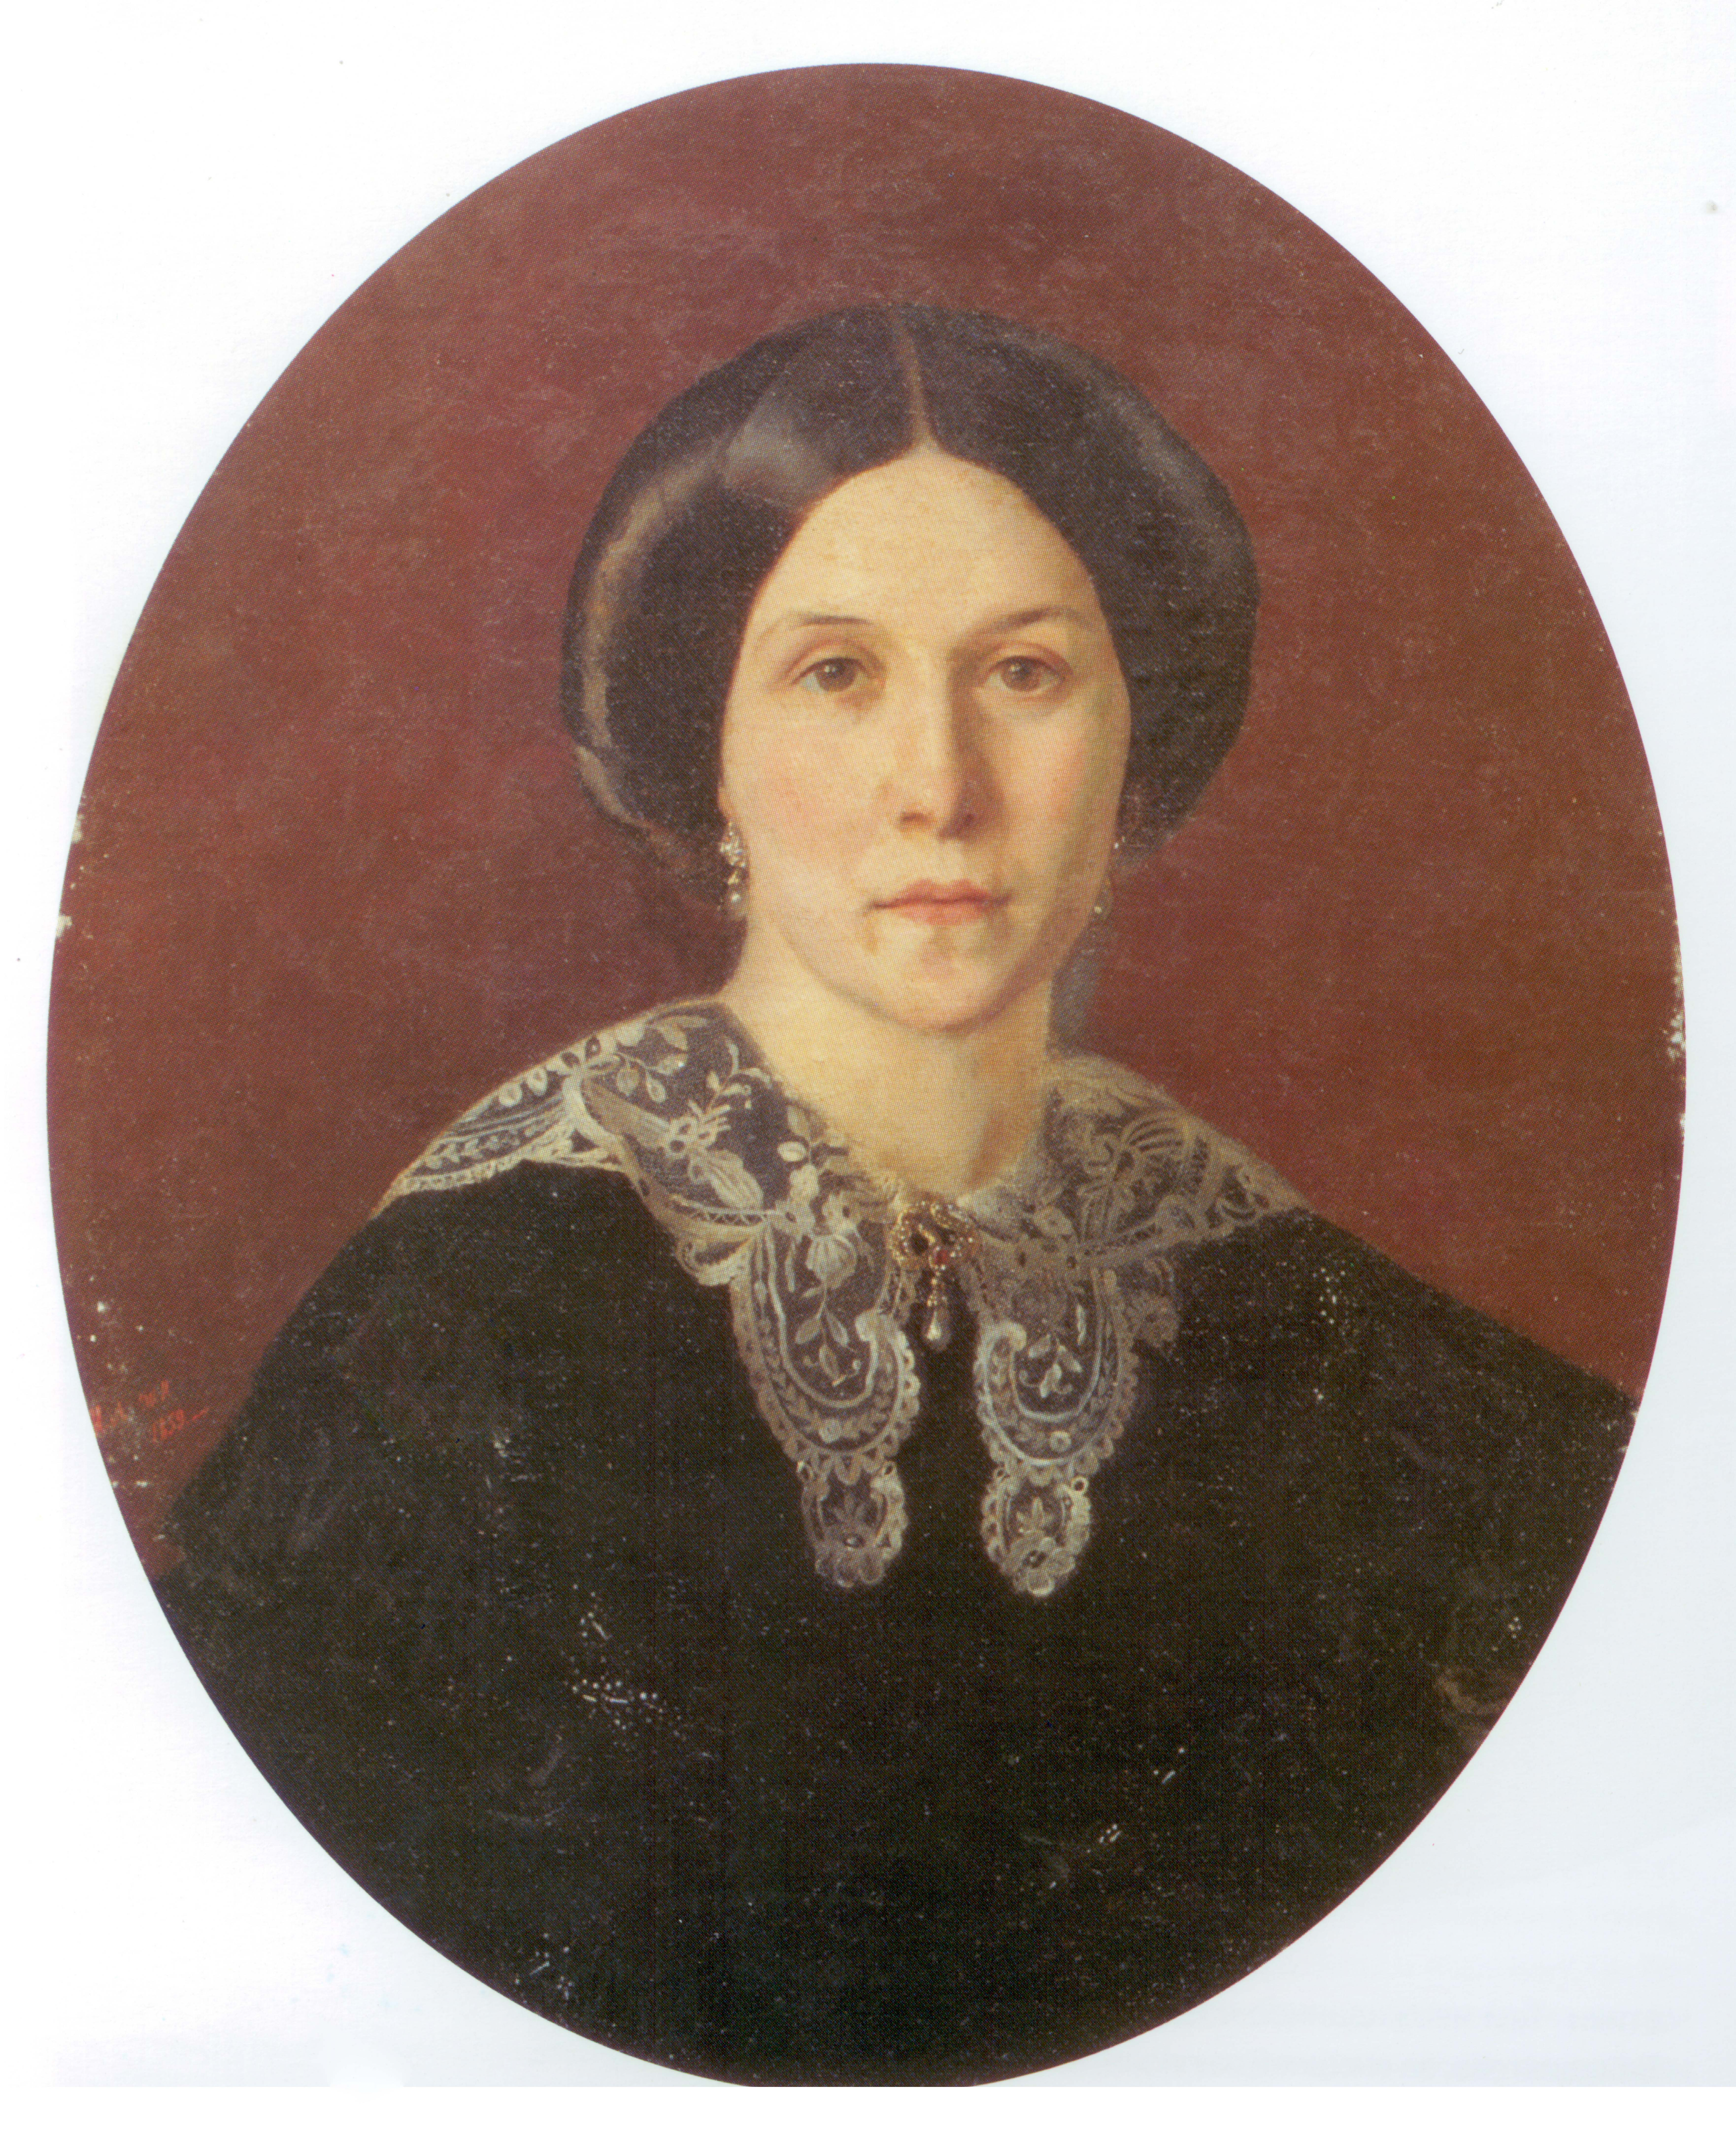 File:А.А.Брюллова.jpg - Wikimedia Commons